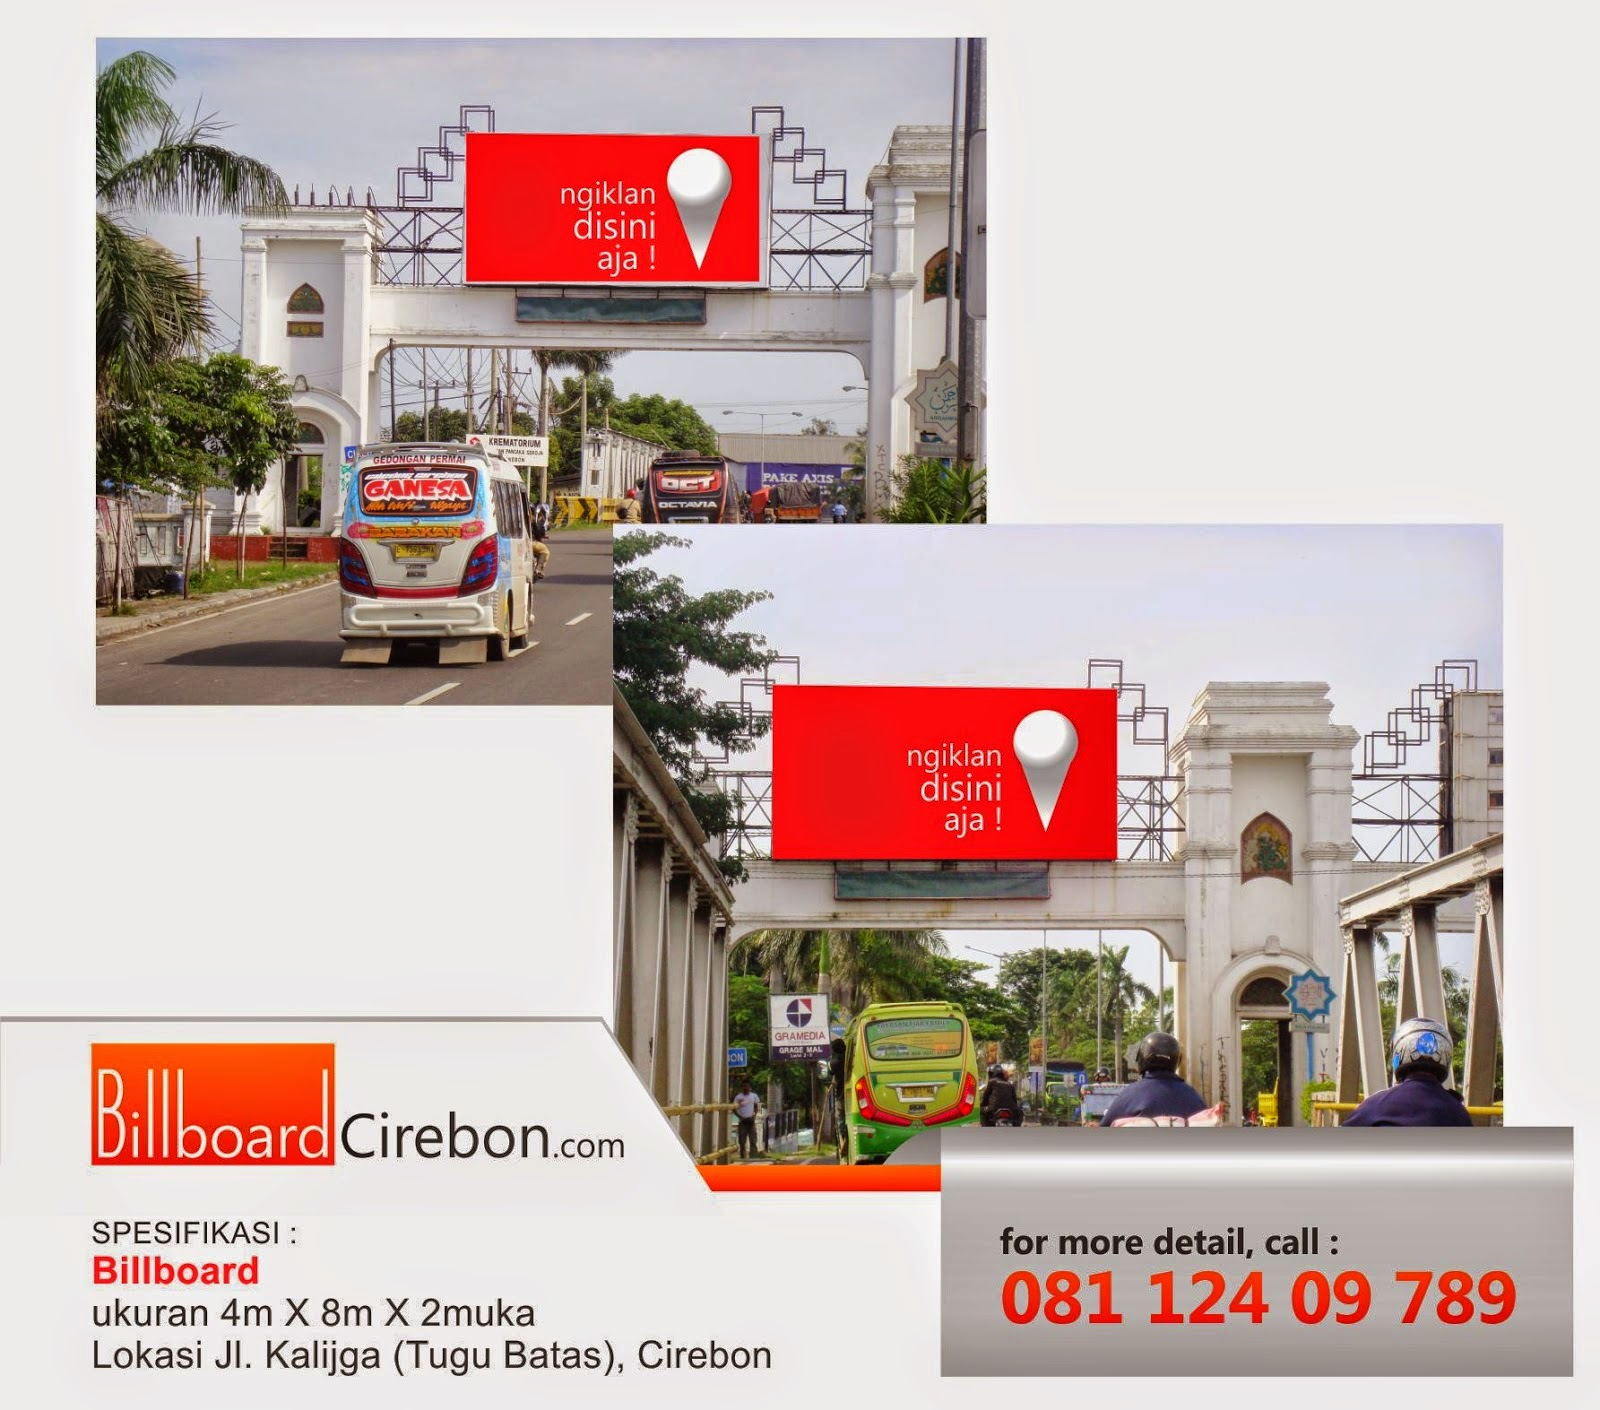 Pasang Billboard Kalijaga / Tugu Batas Cirebon